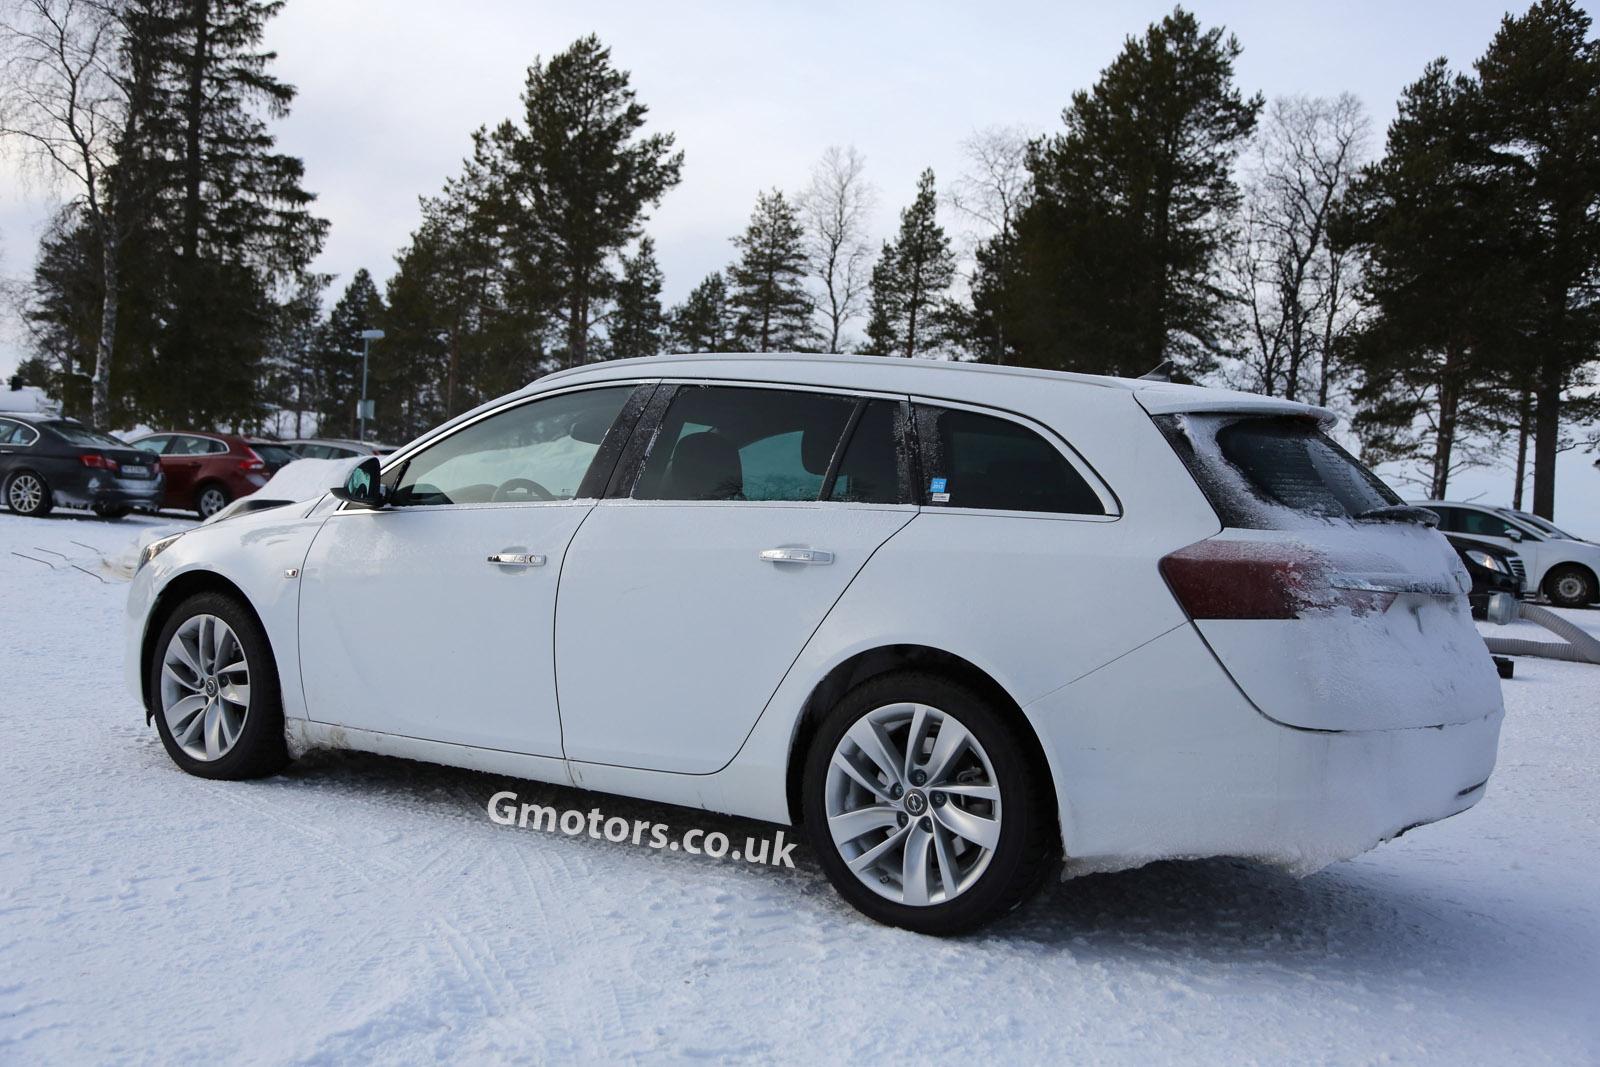 2017 - [Opel] Insignia Grand Sport [E2JO] 2016-Vauxhall-Opel-Insignia-mule-7